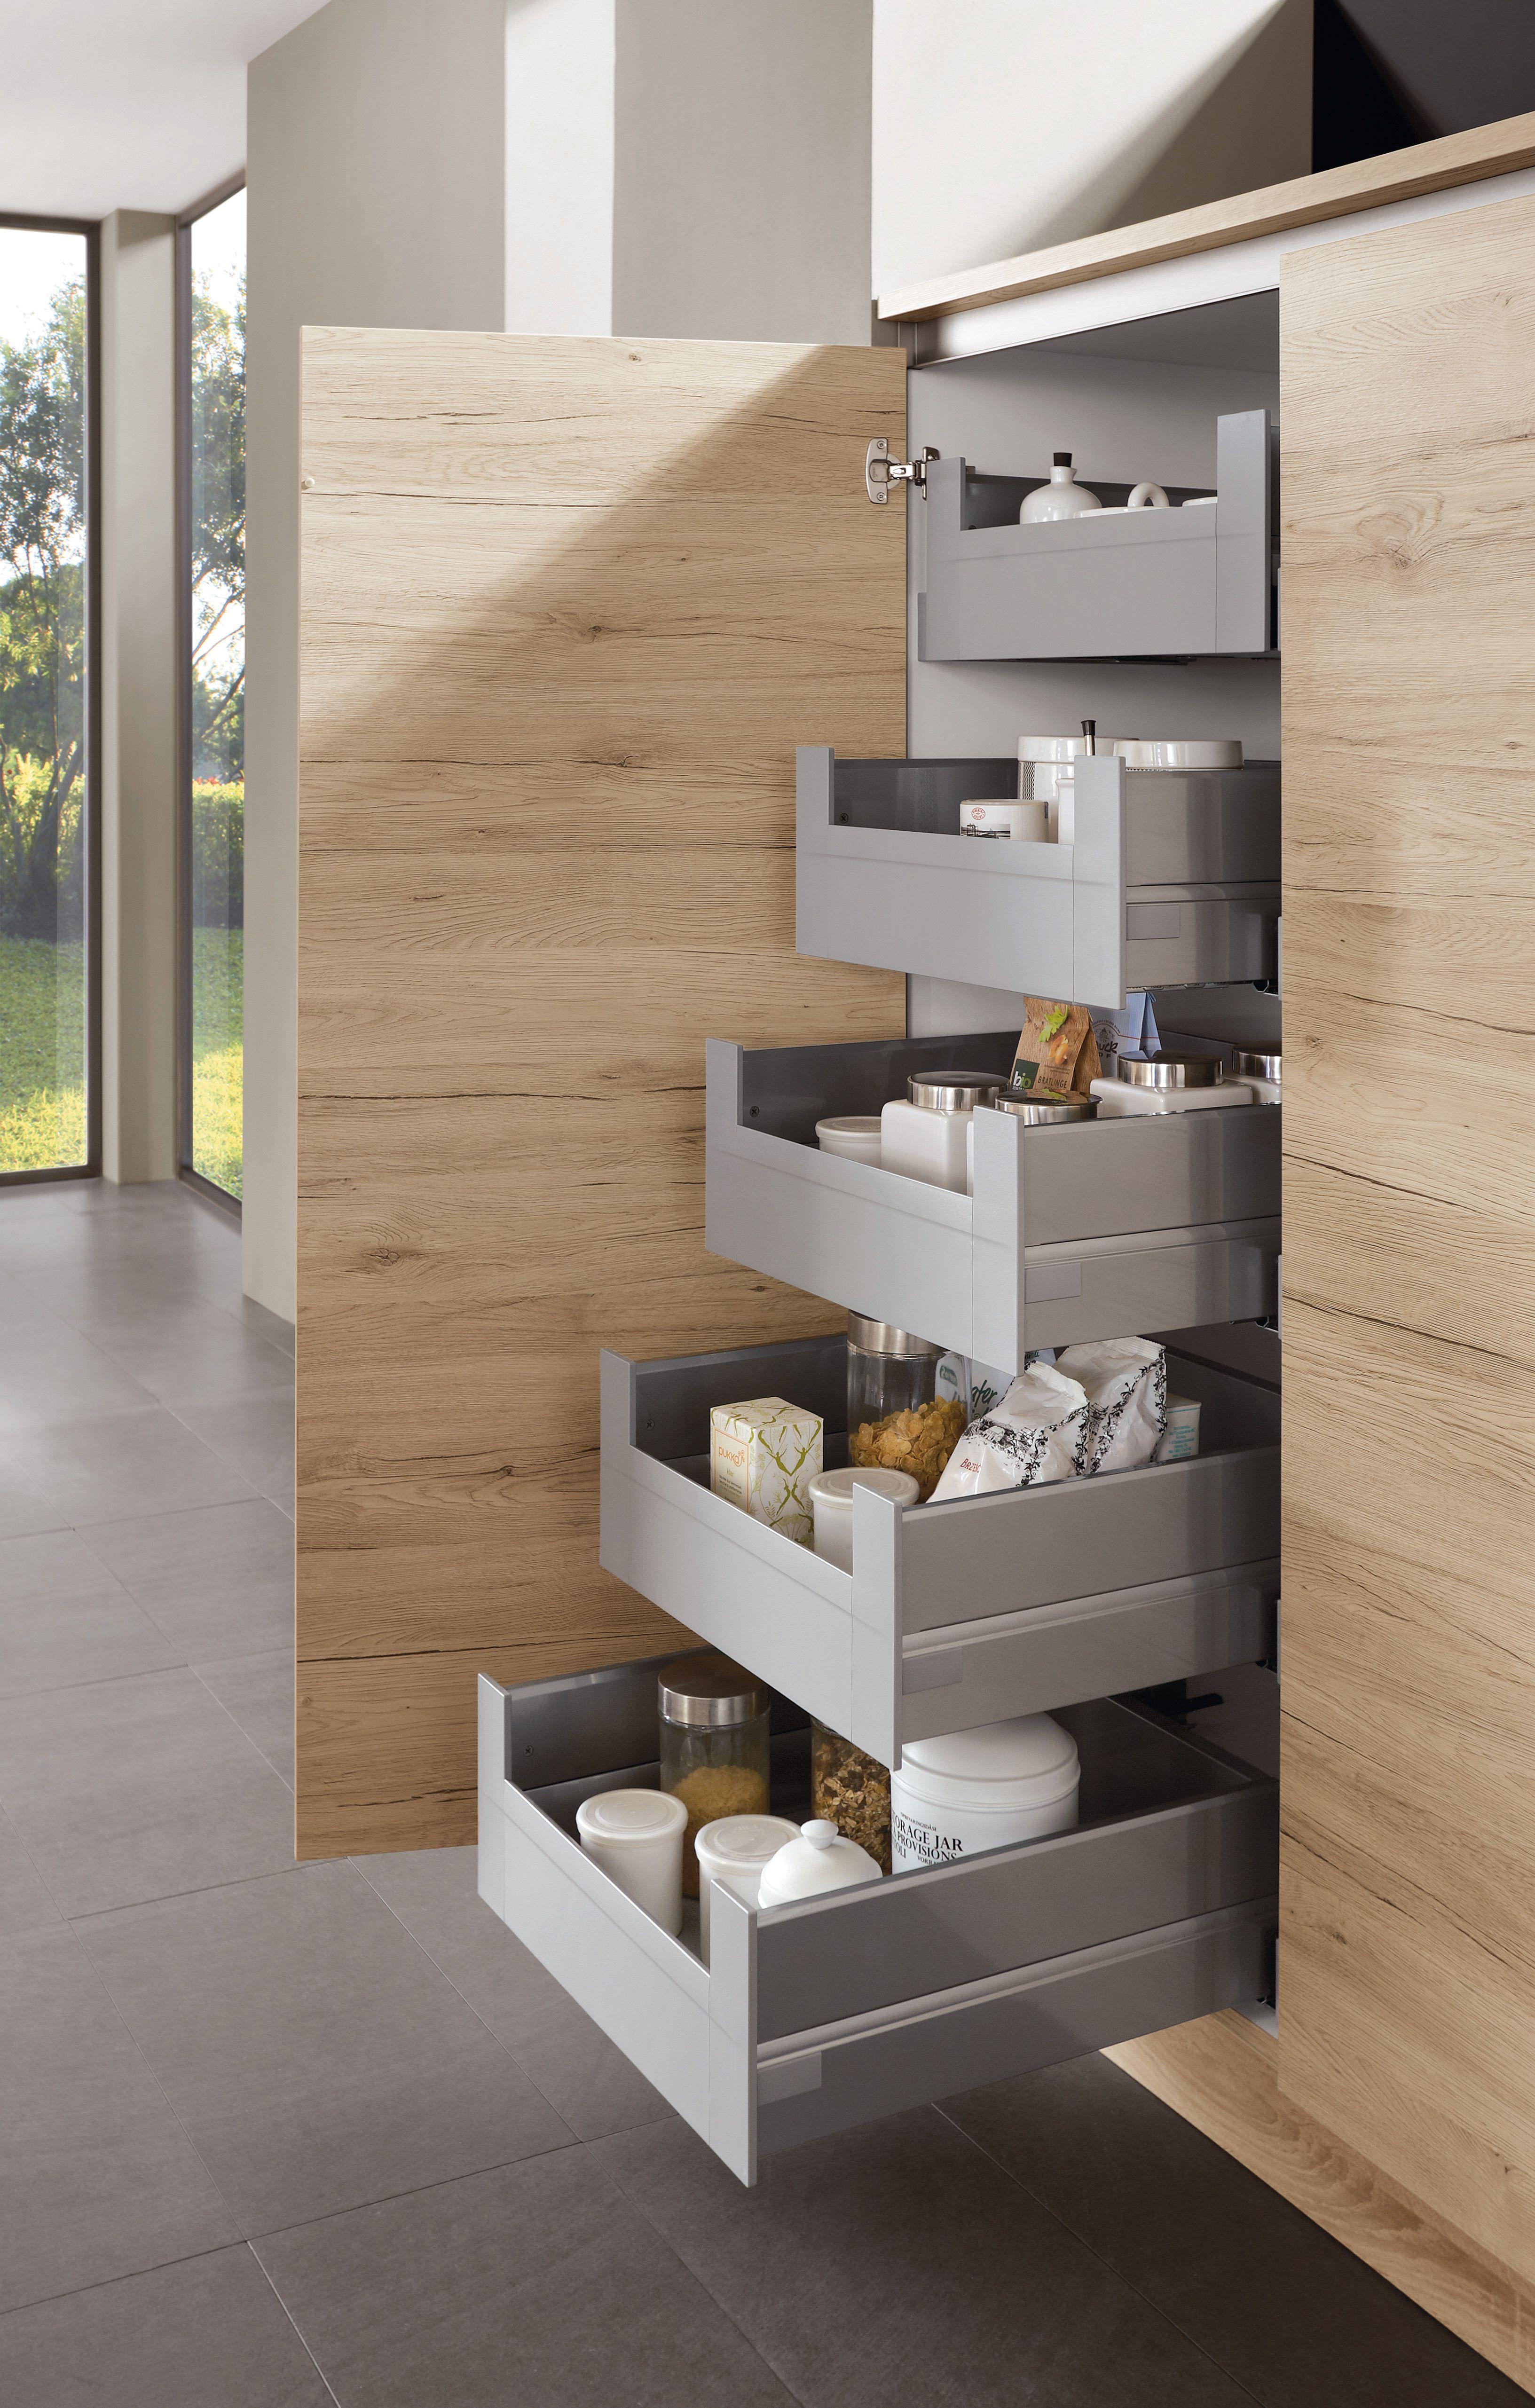 tiroir de rangement cuisine but rangement cuisine armoire rangement design de cuisine moderne